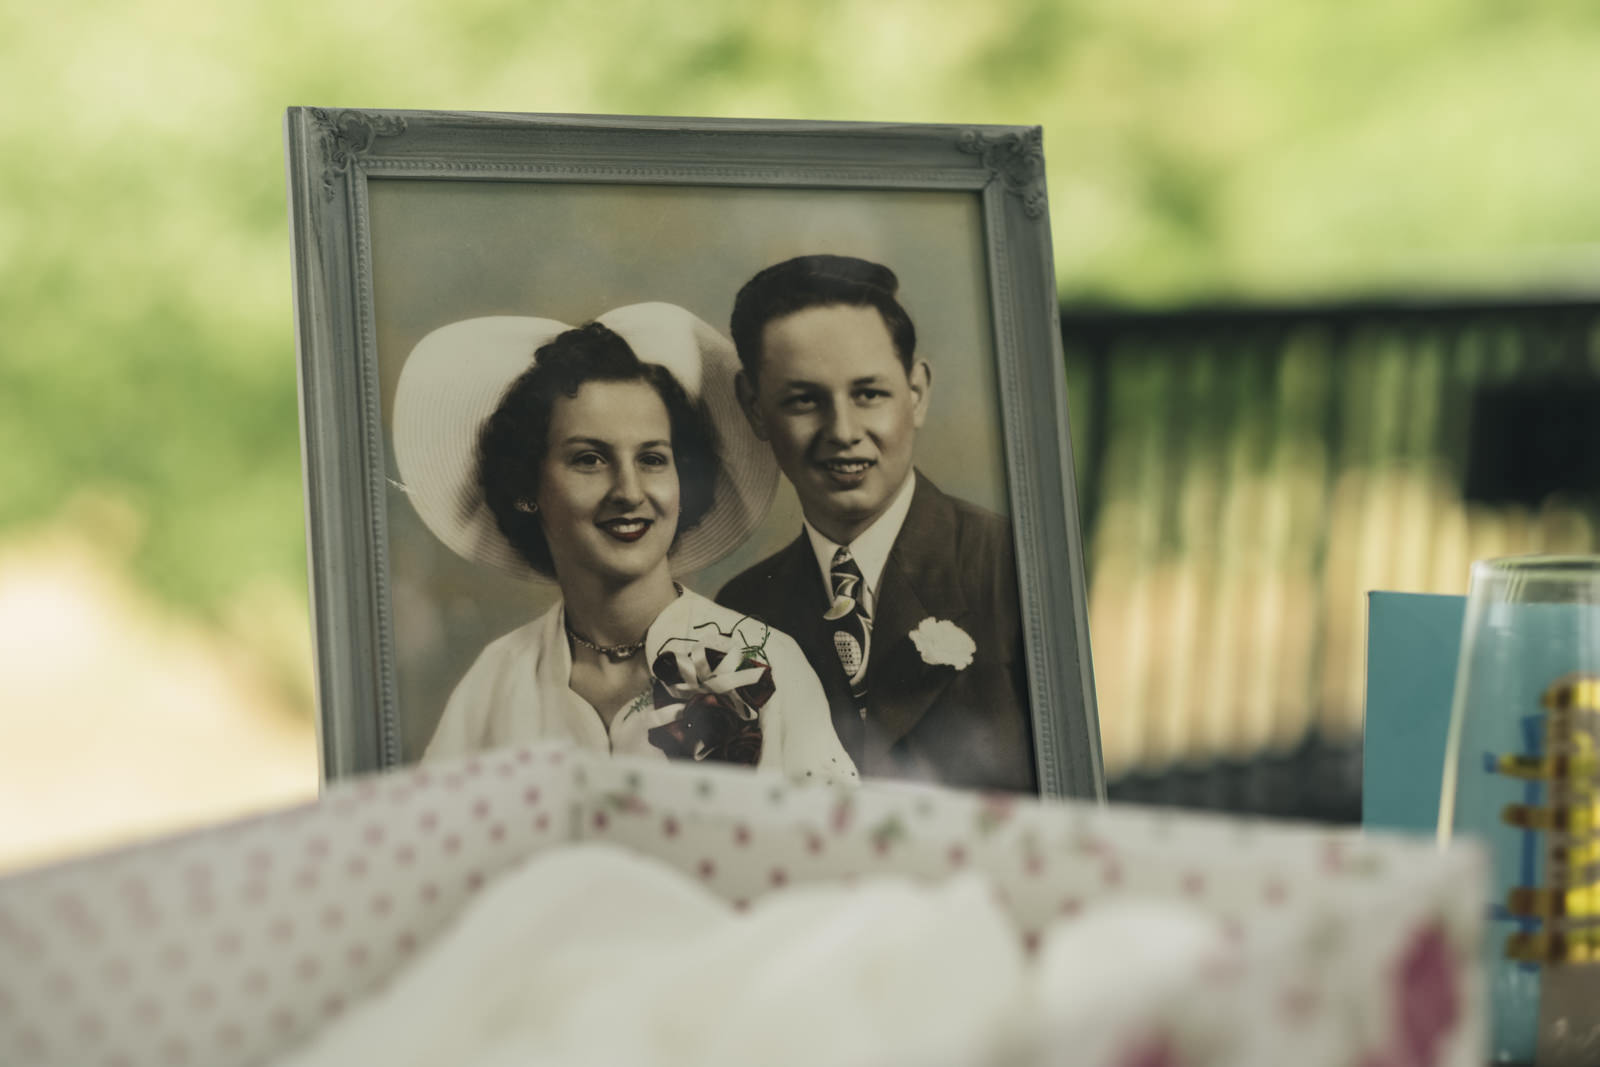 Details at a wedding elopement in Toledo, Ohio.